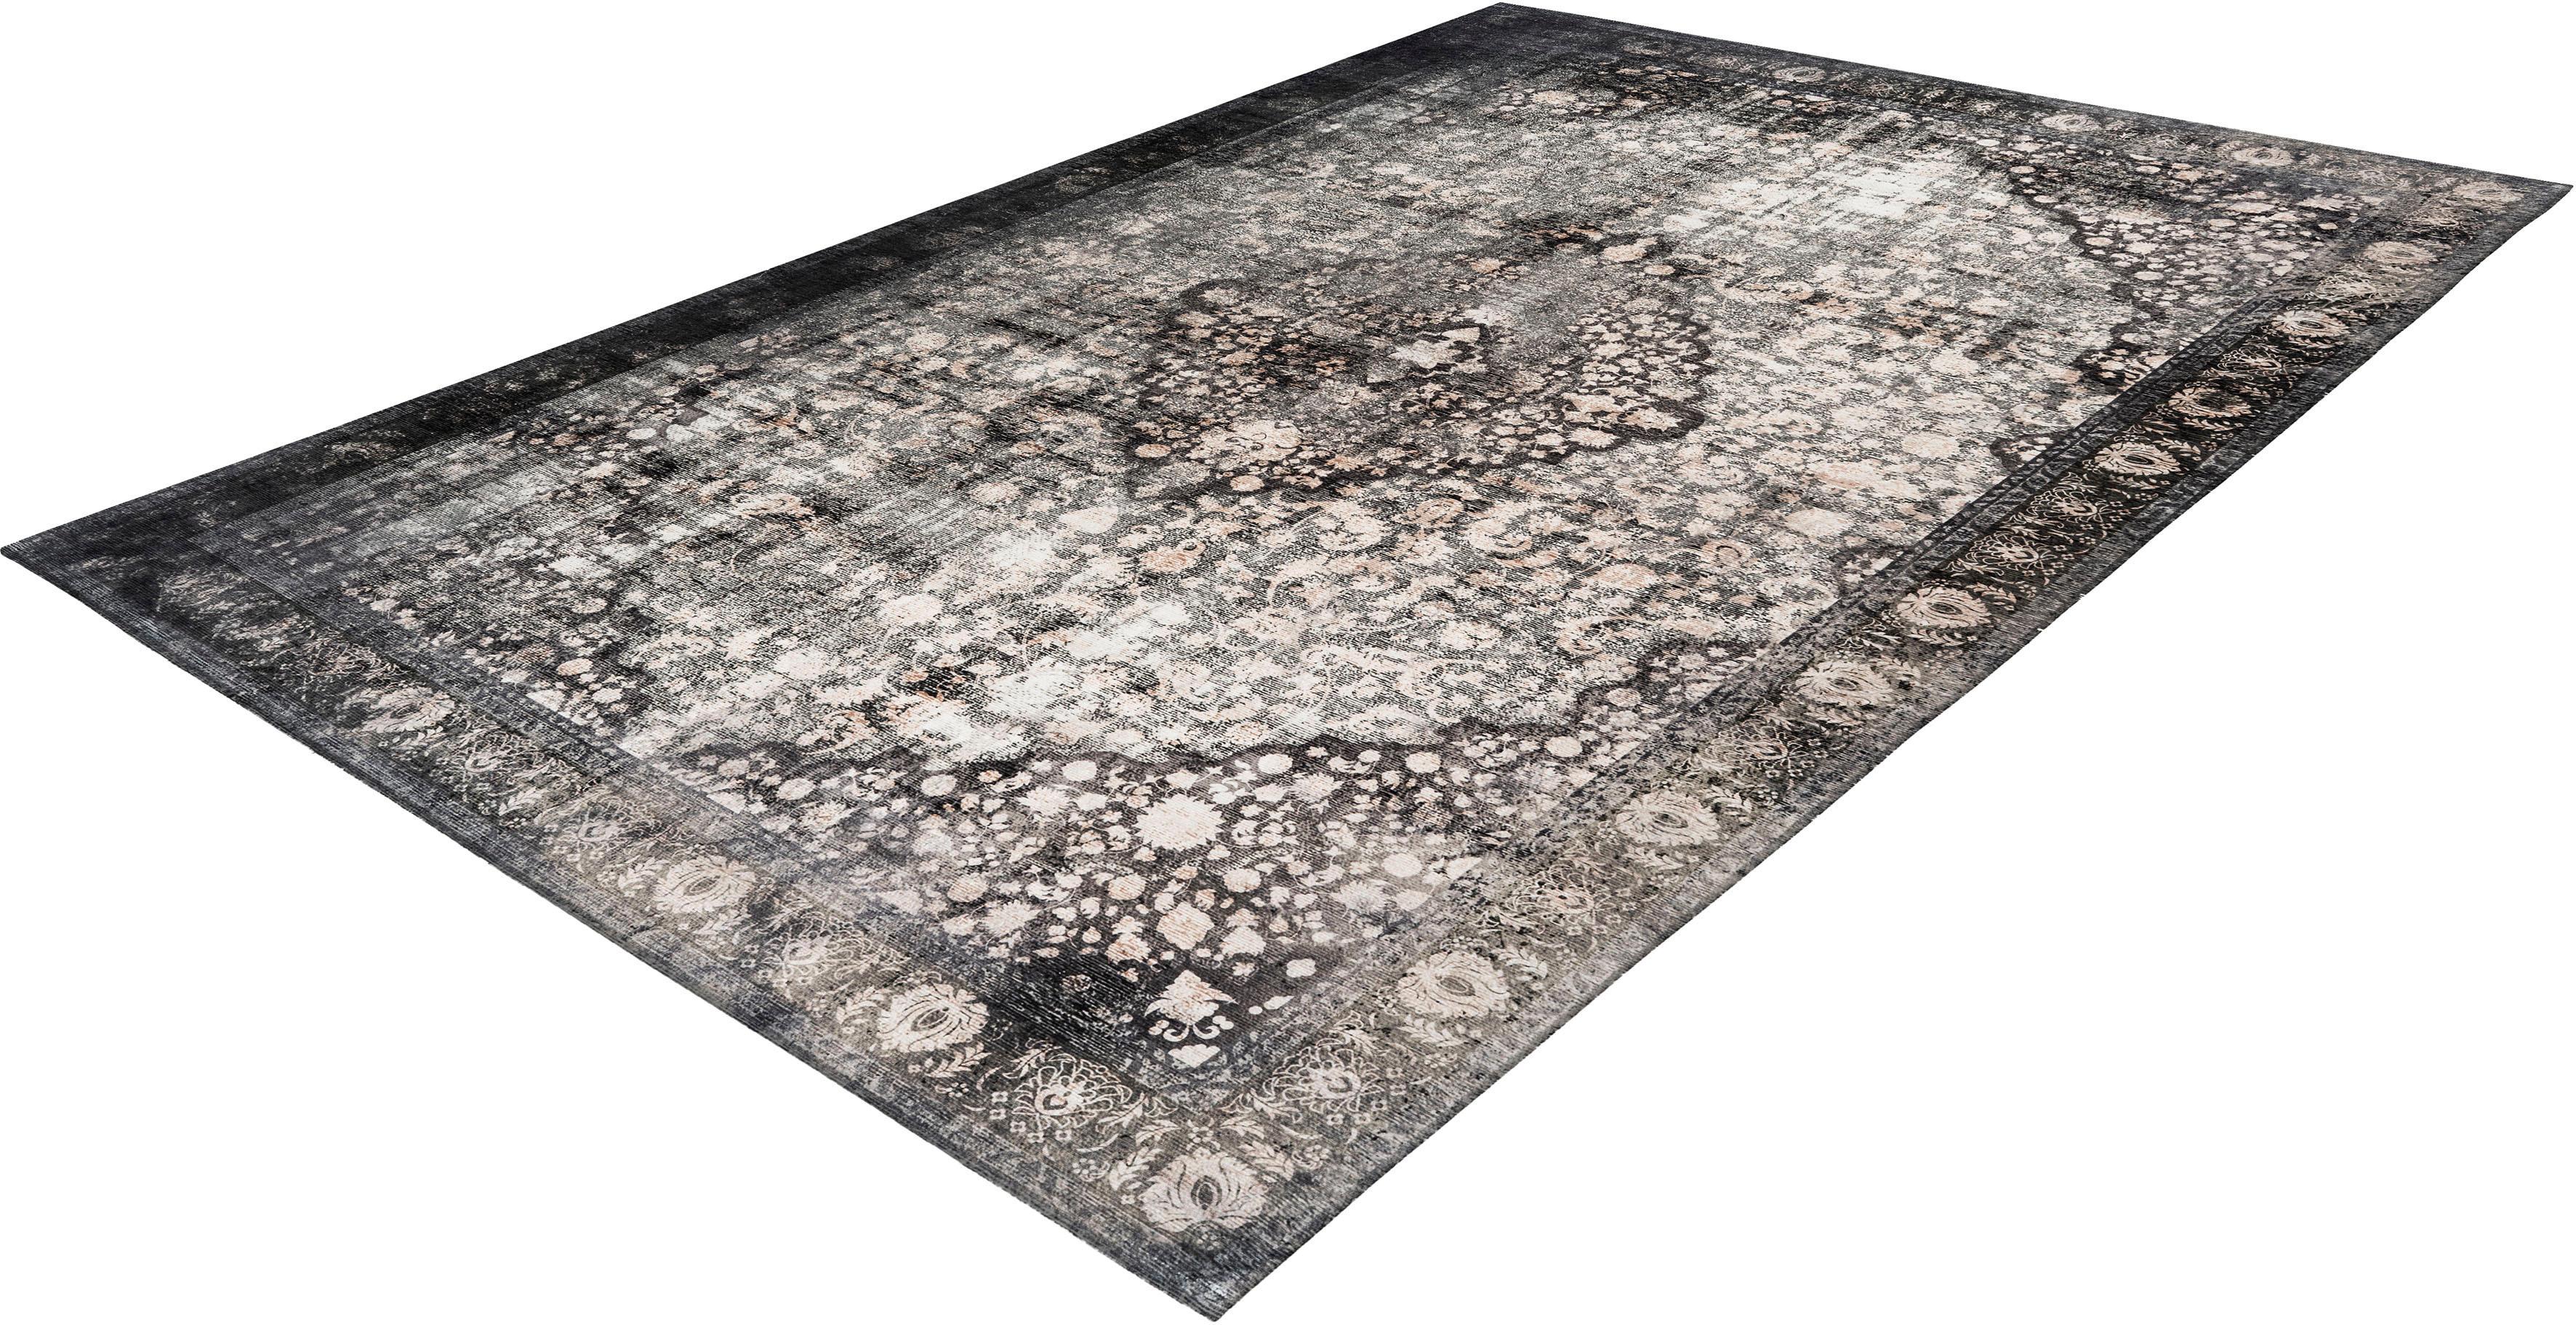 Teppich Vintage 8402 Arte Espina rechteckig Höhe 9 mm maschinell gewebt